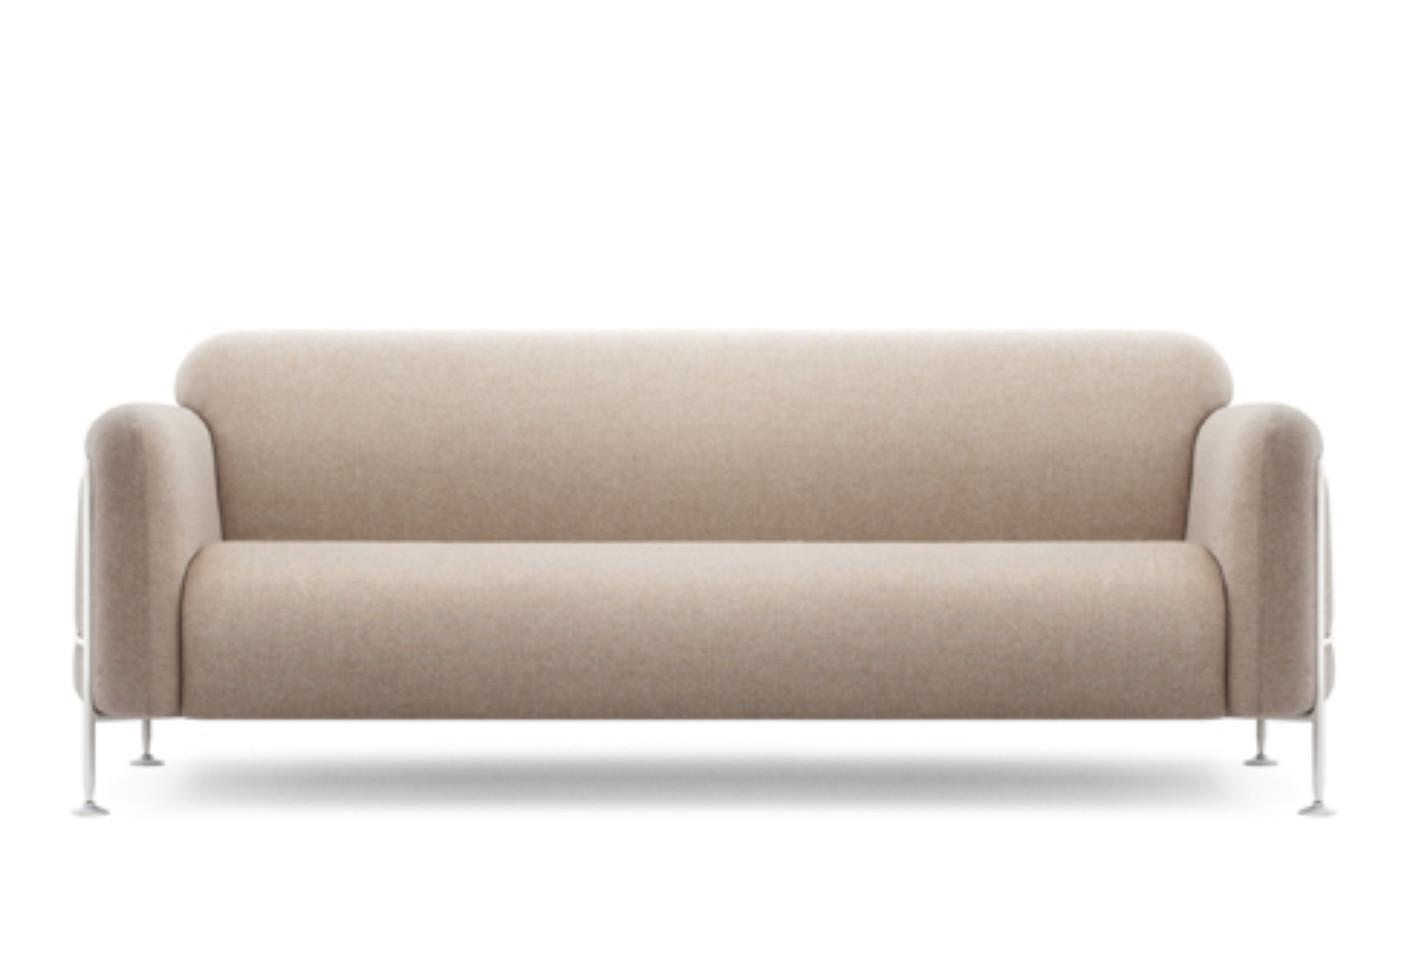 mega sofa mega sofa by mproductions stylepark thesofa. Black Bedroom Furniture Sets. Home Design Ideas